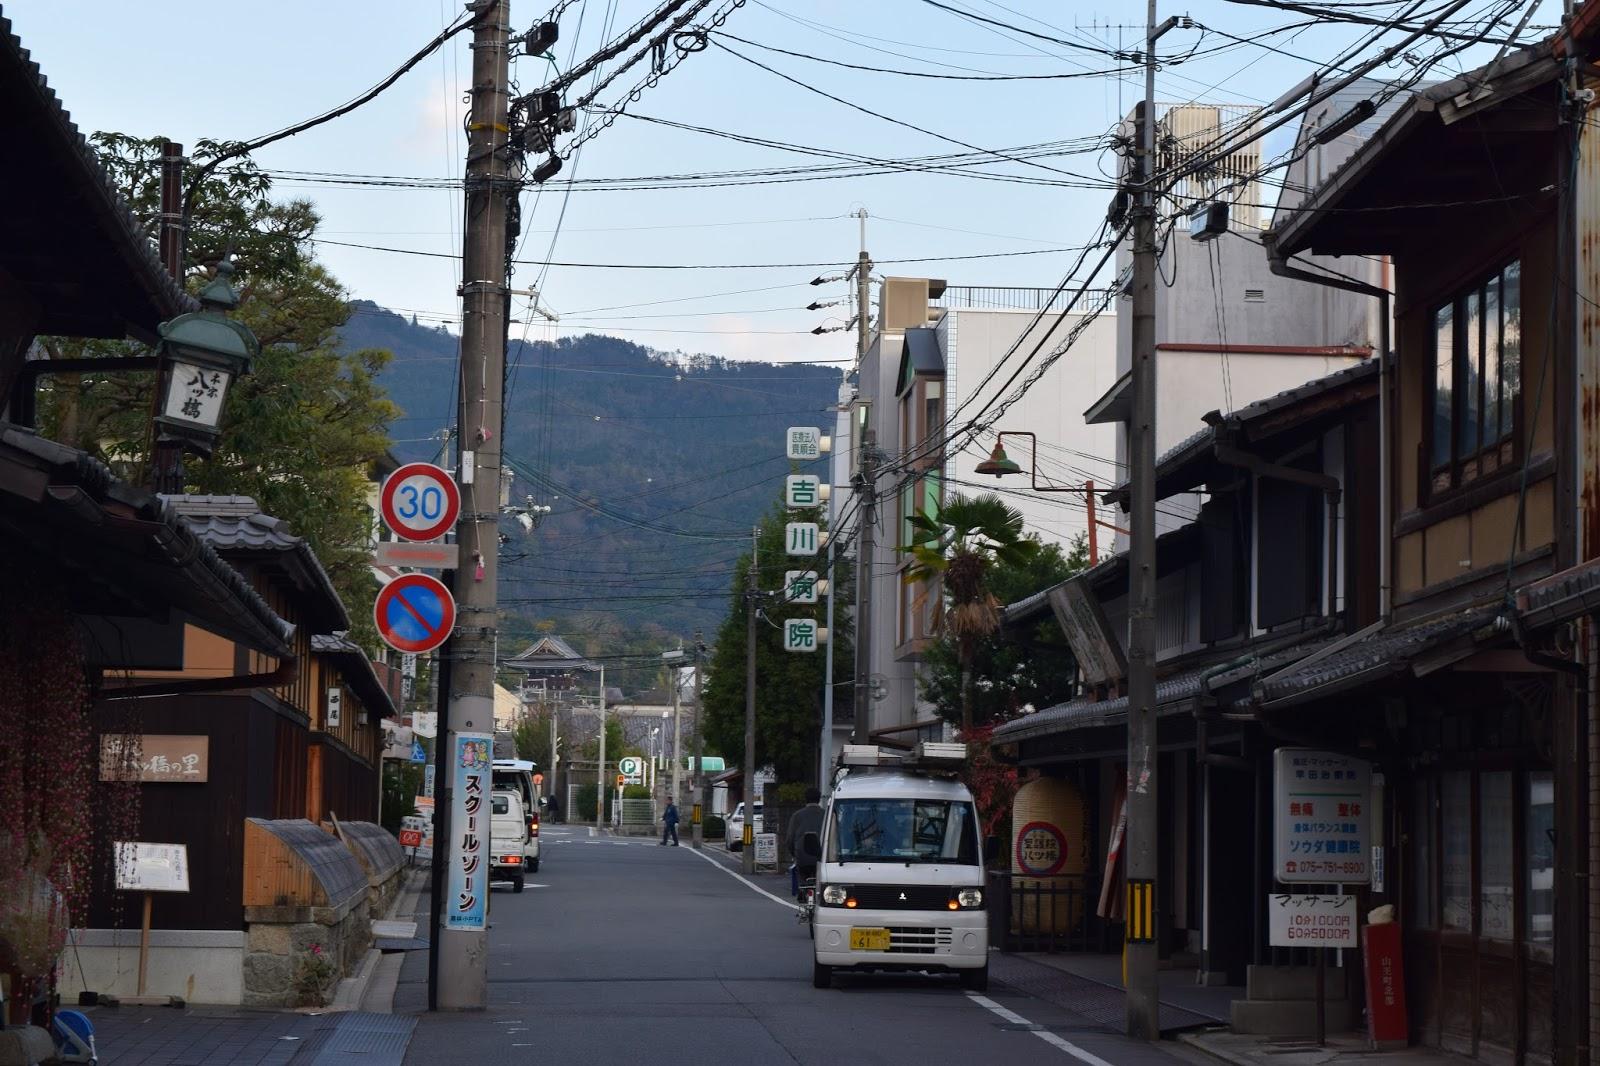 Kyoto Japan street